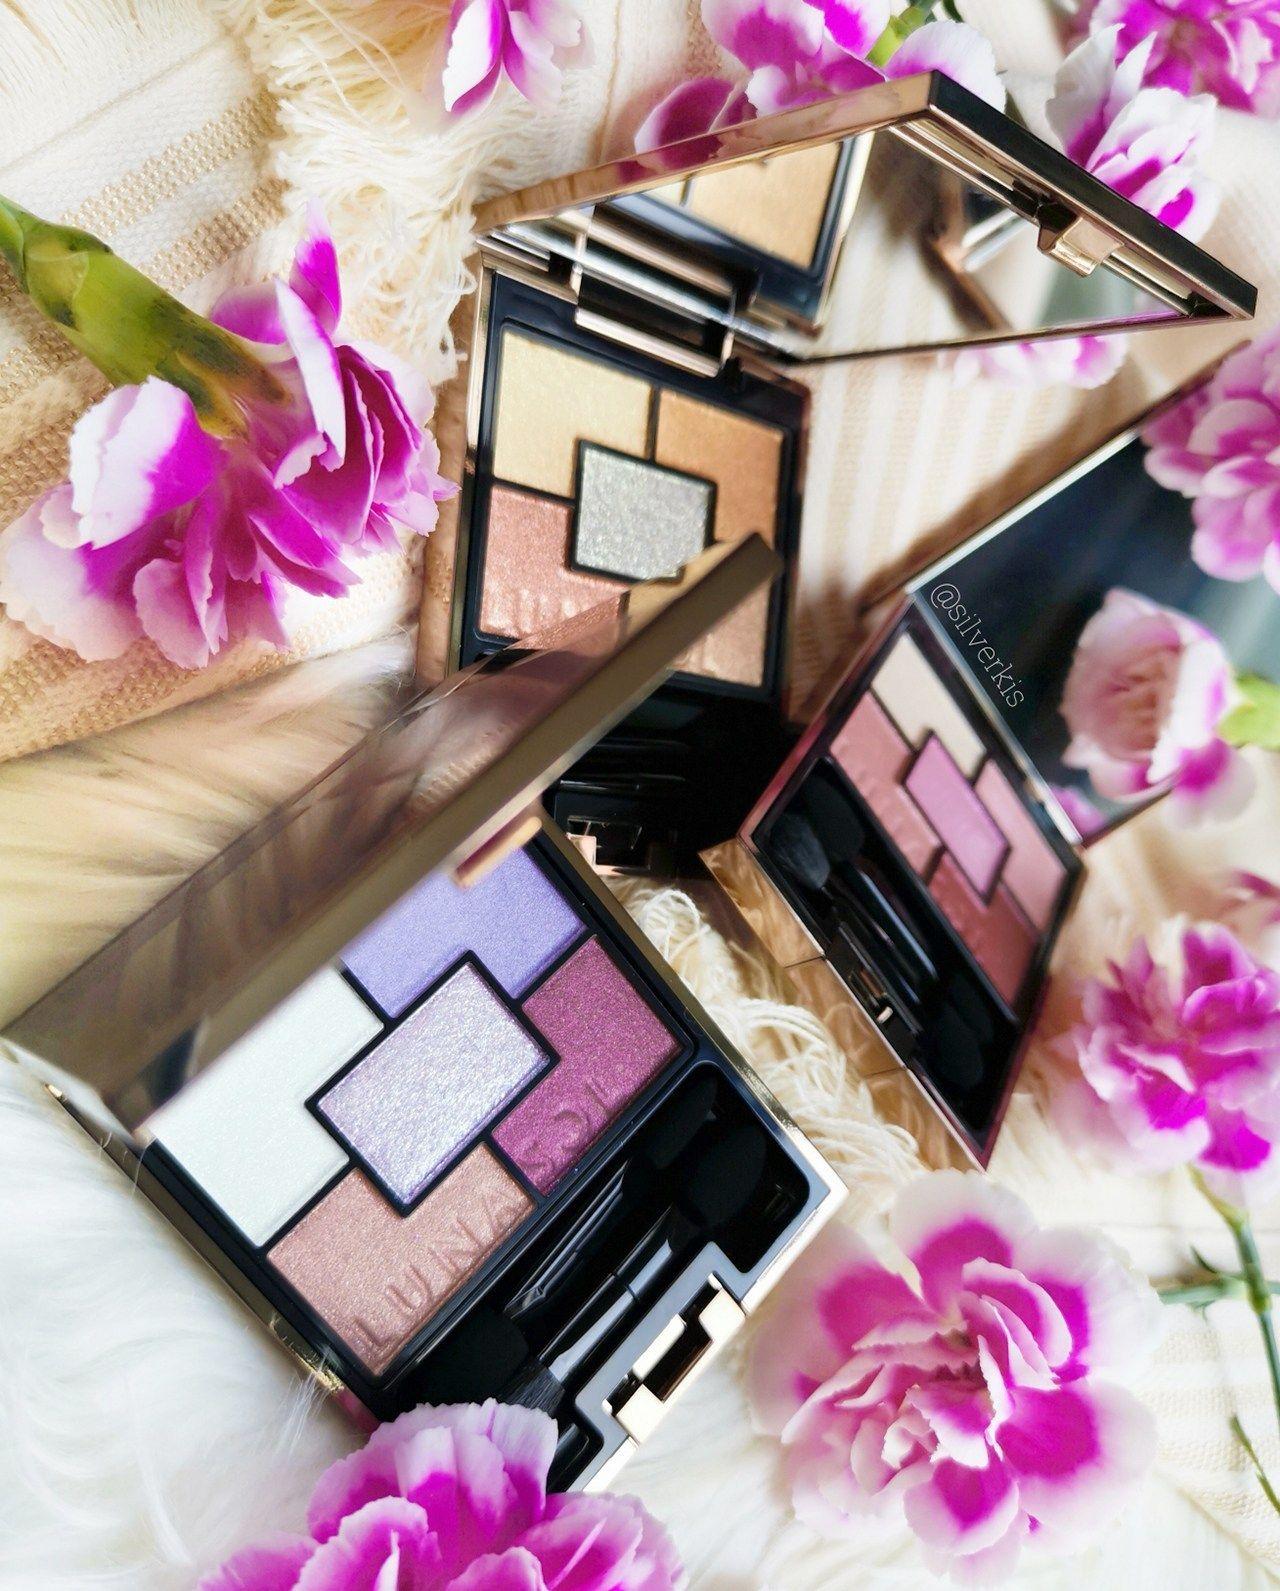 Top 10 Highend Cosmetic Brands in 2017 Luxury cosmetics